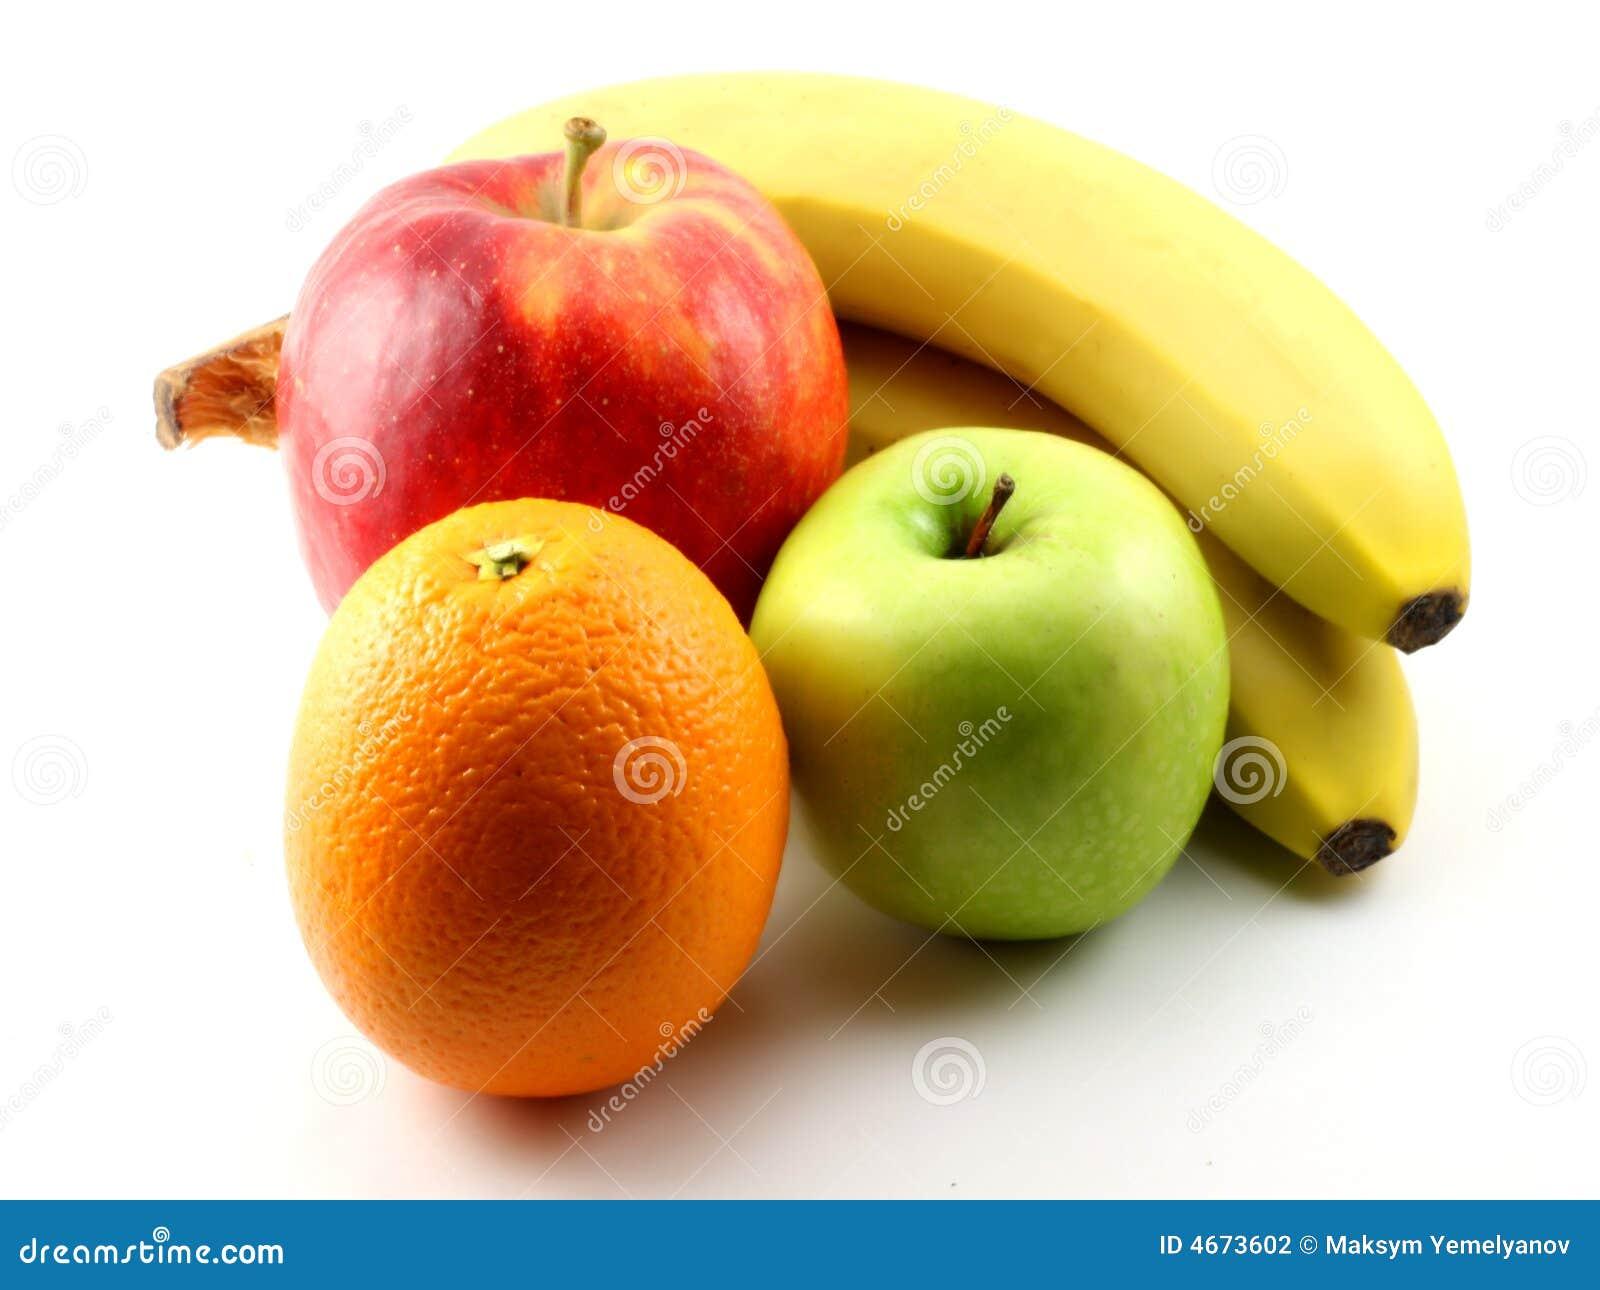 Apples Bananas And Orange Stock Photography Image 4673602